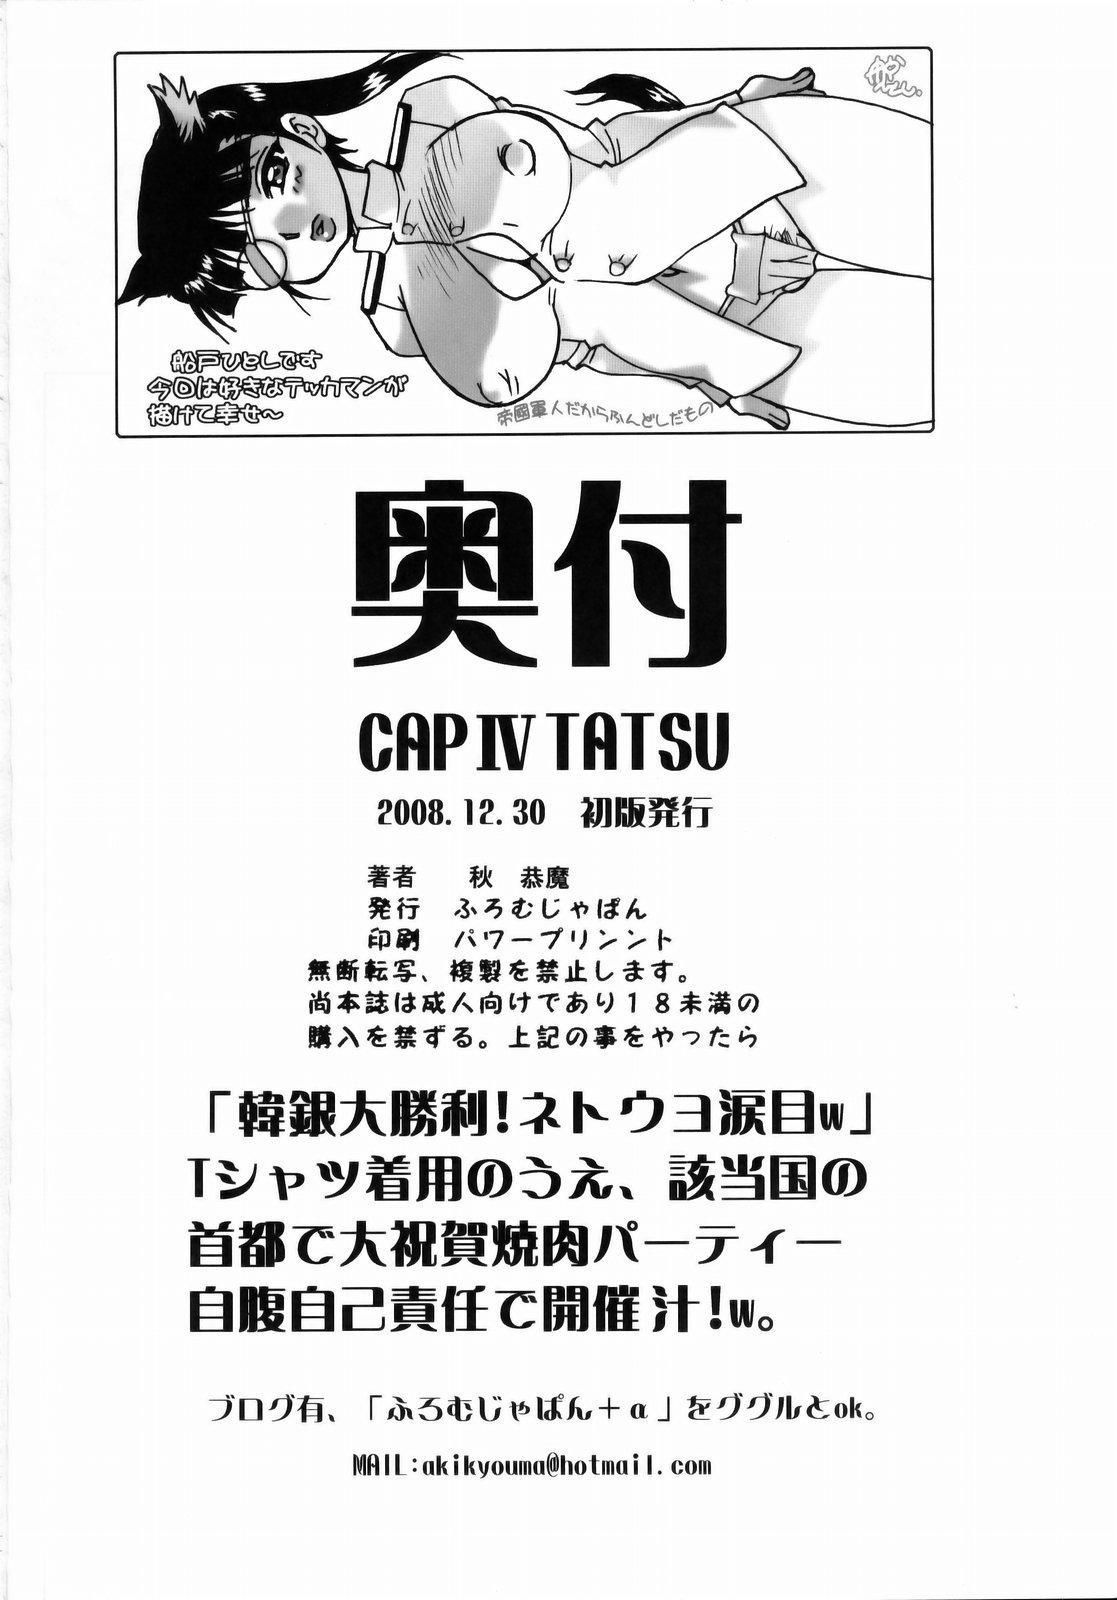 CAP IV TATSU 32